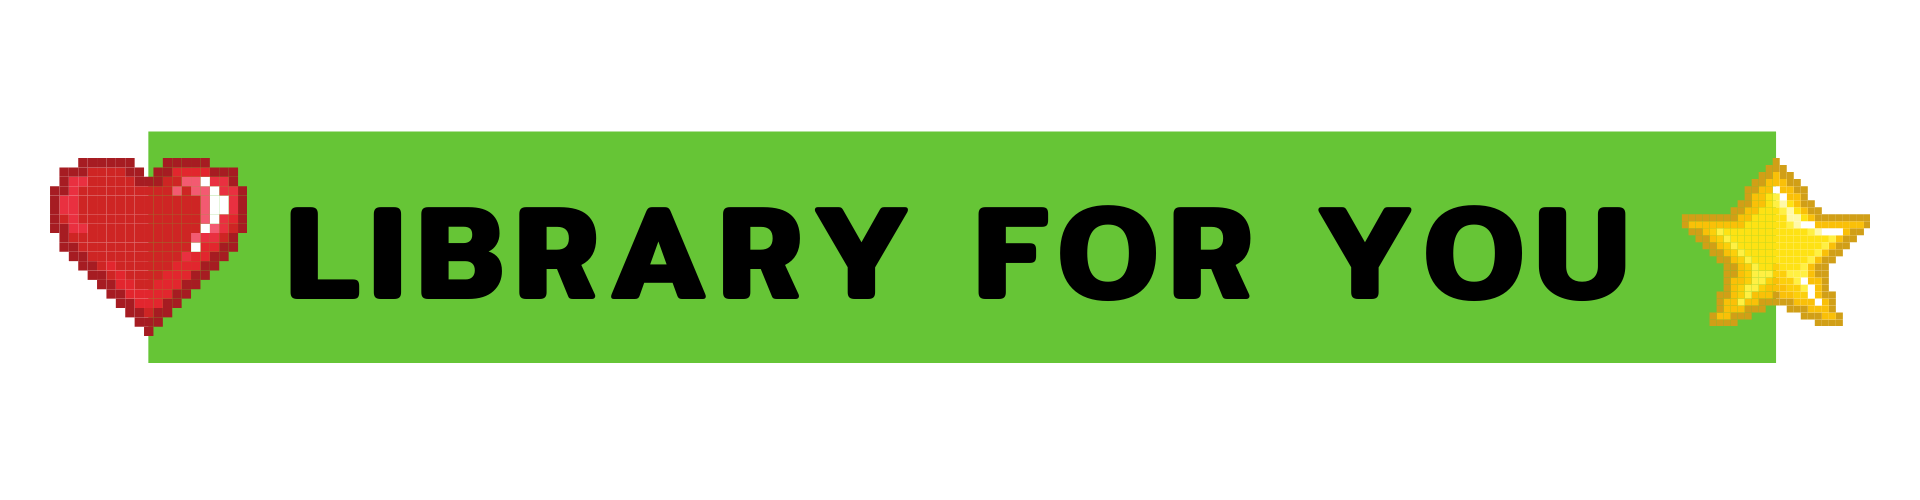 libraryForU01